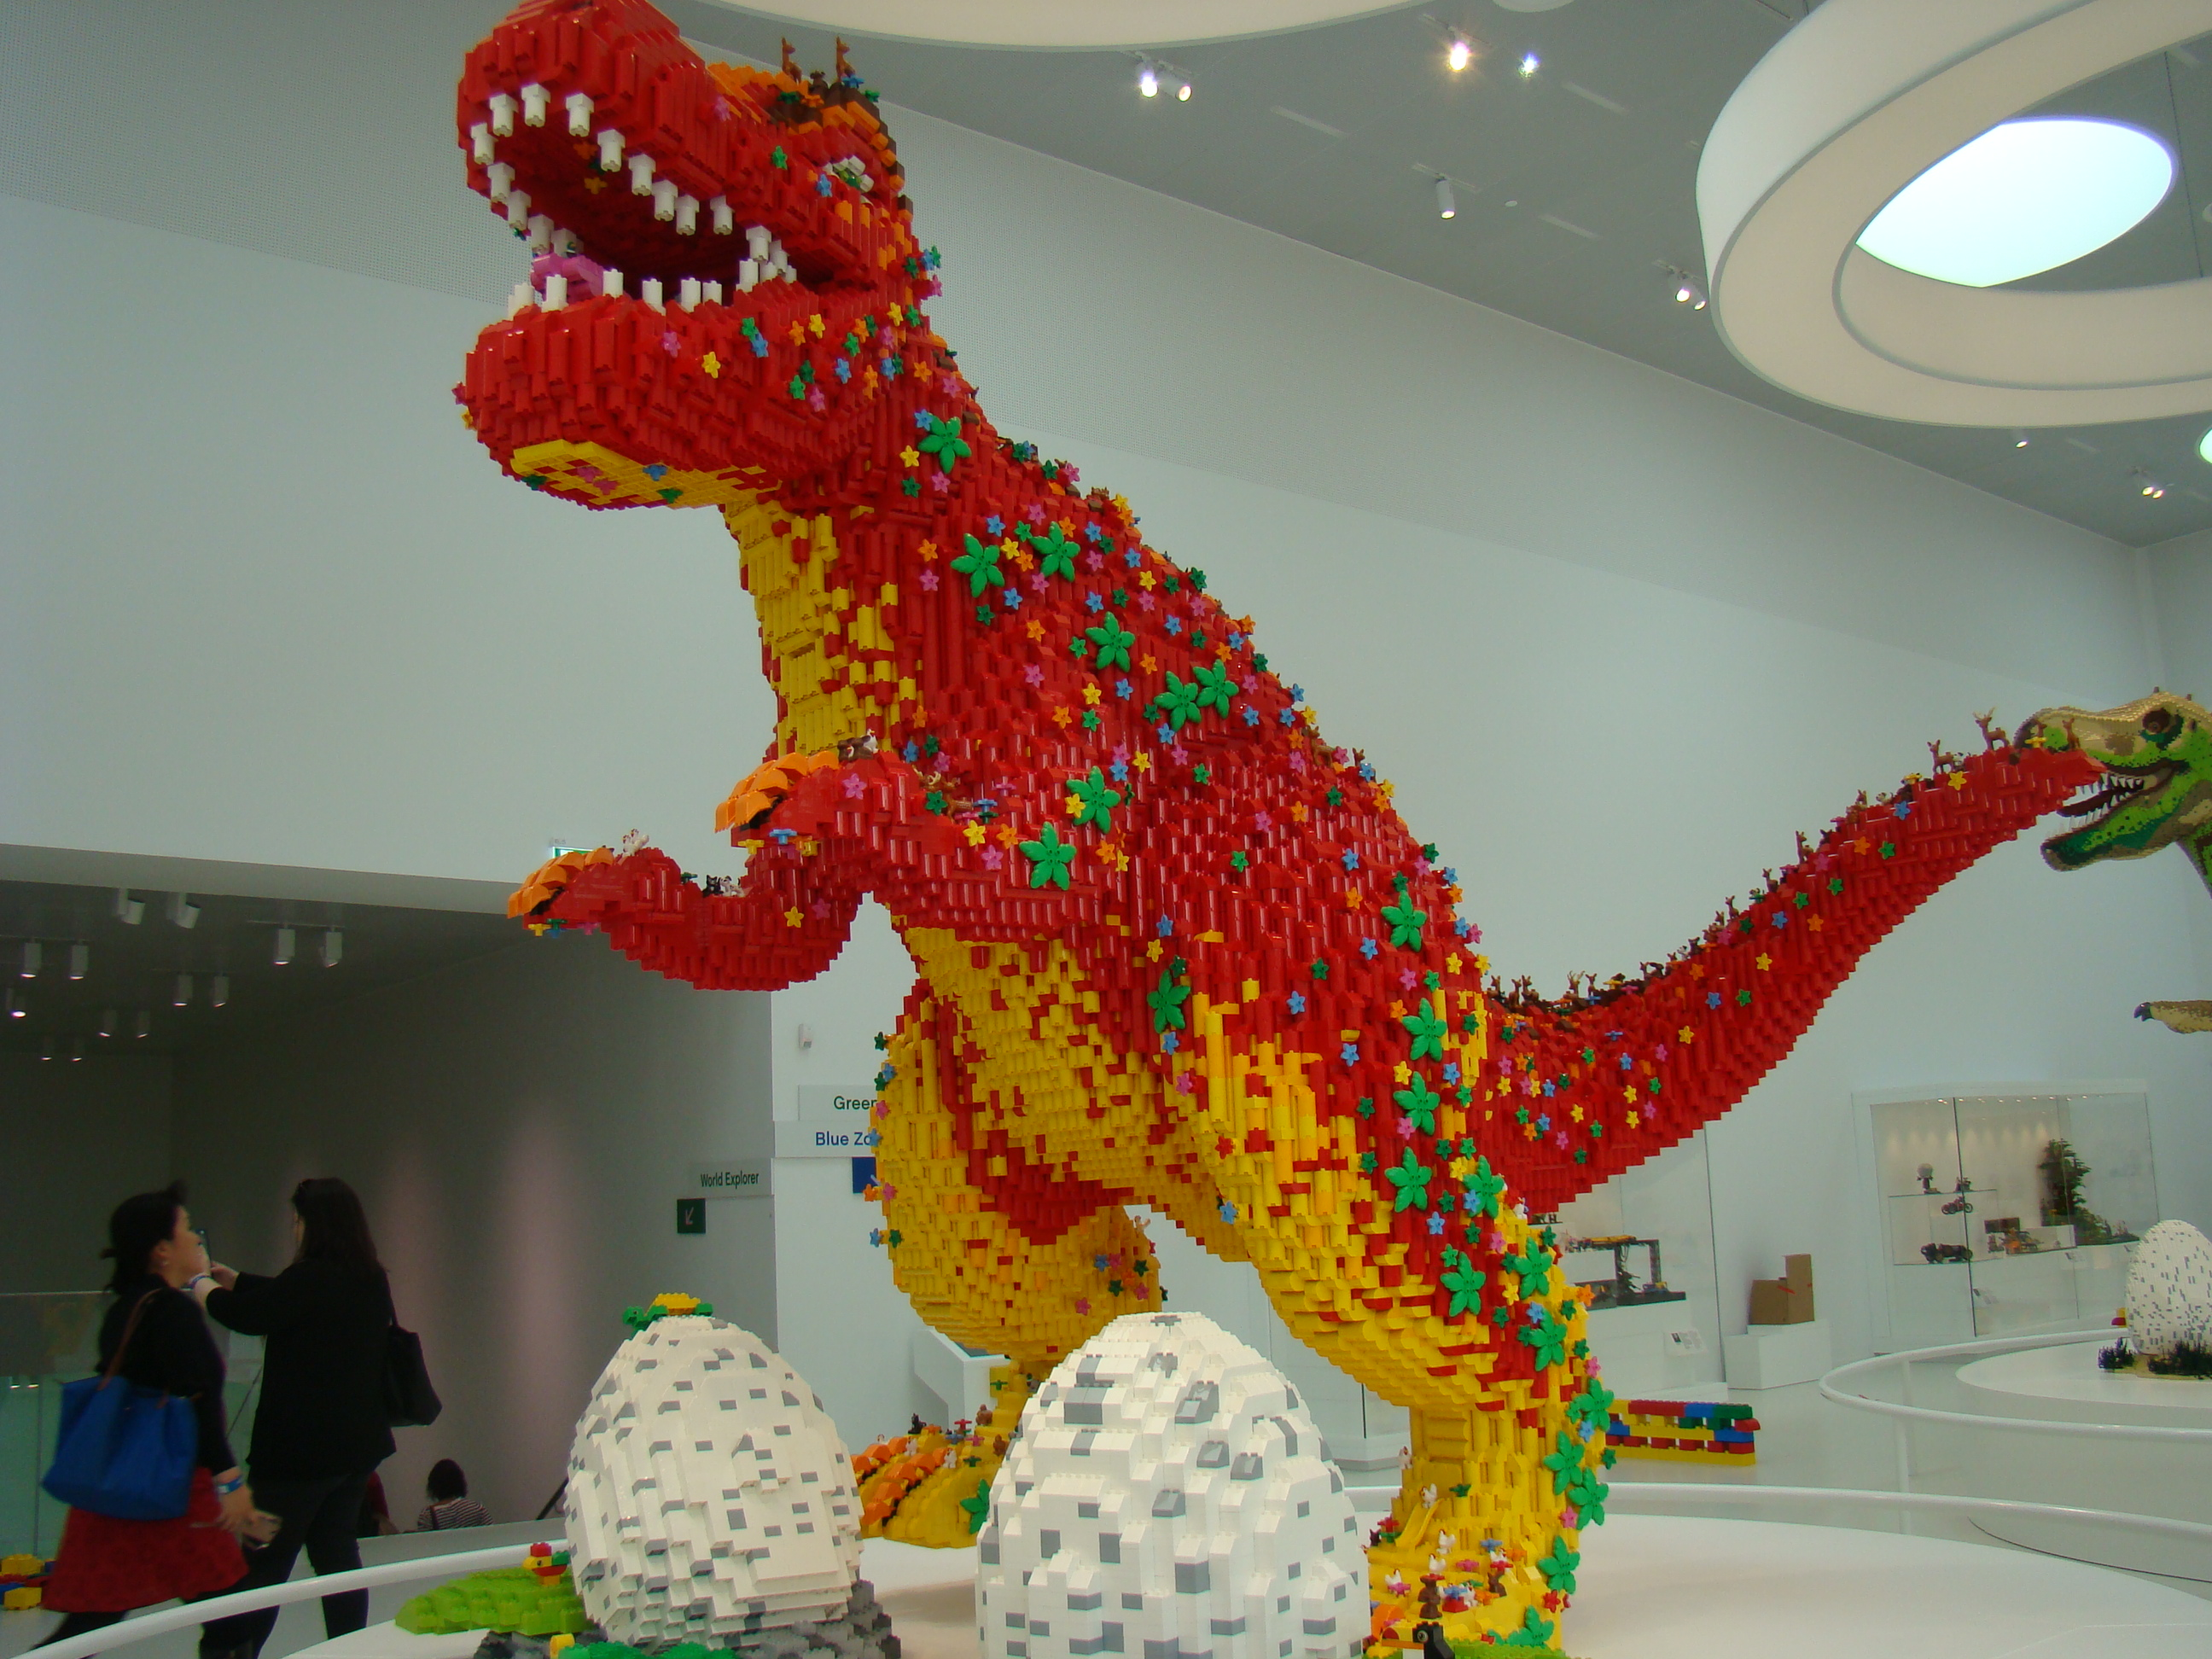 LEGO dinosaur.